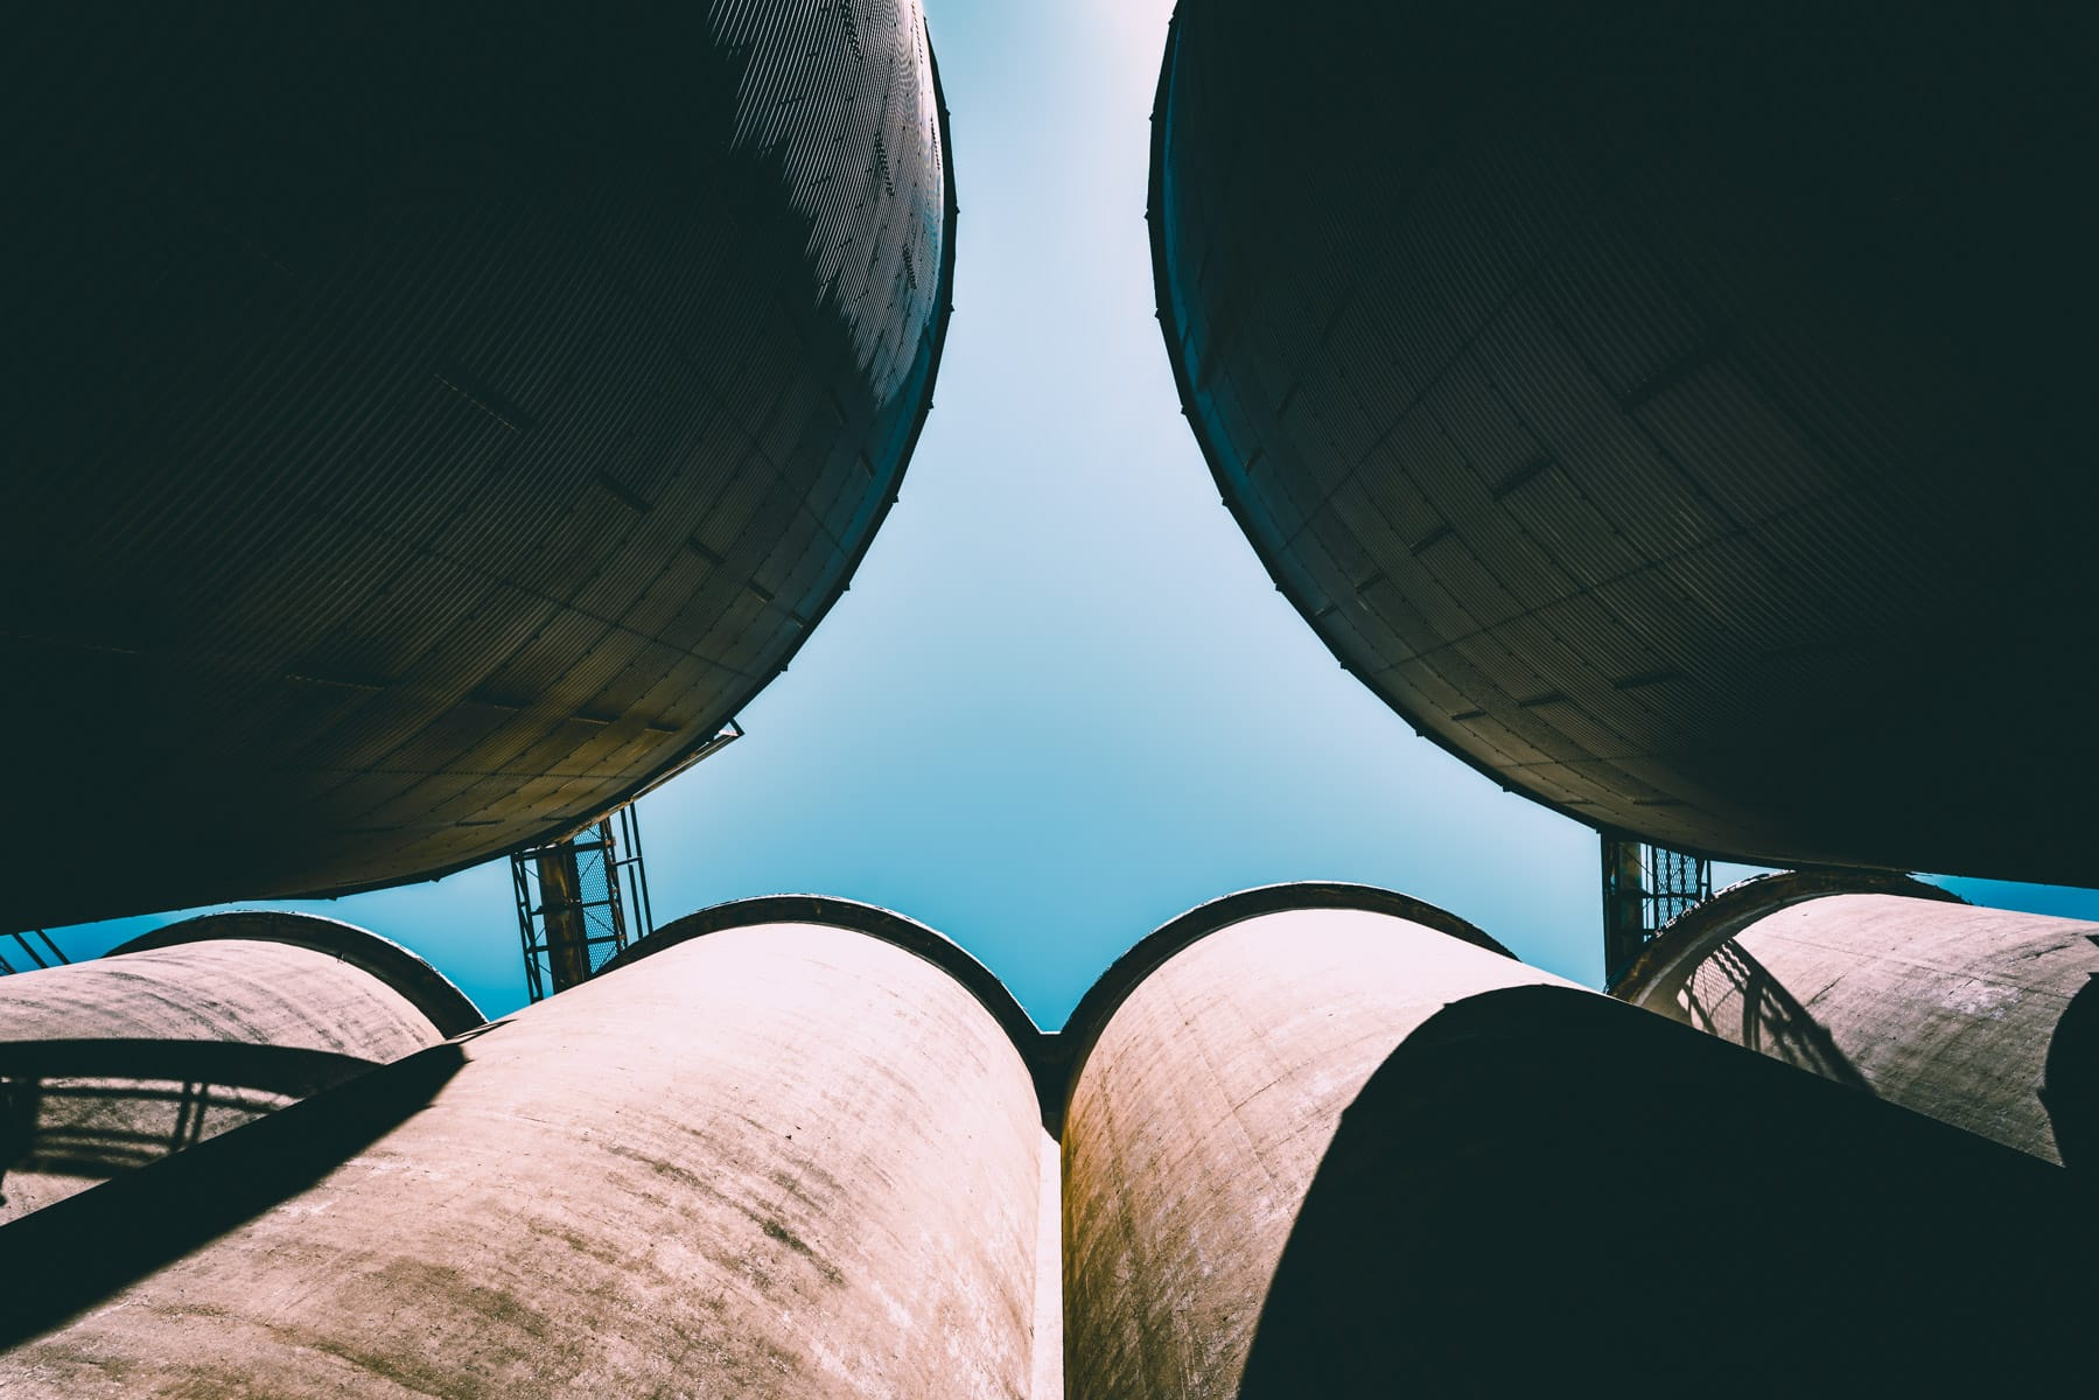 Abandoned grain silos near Downtown McKinney, Texas.